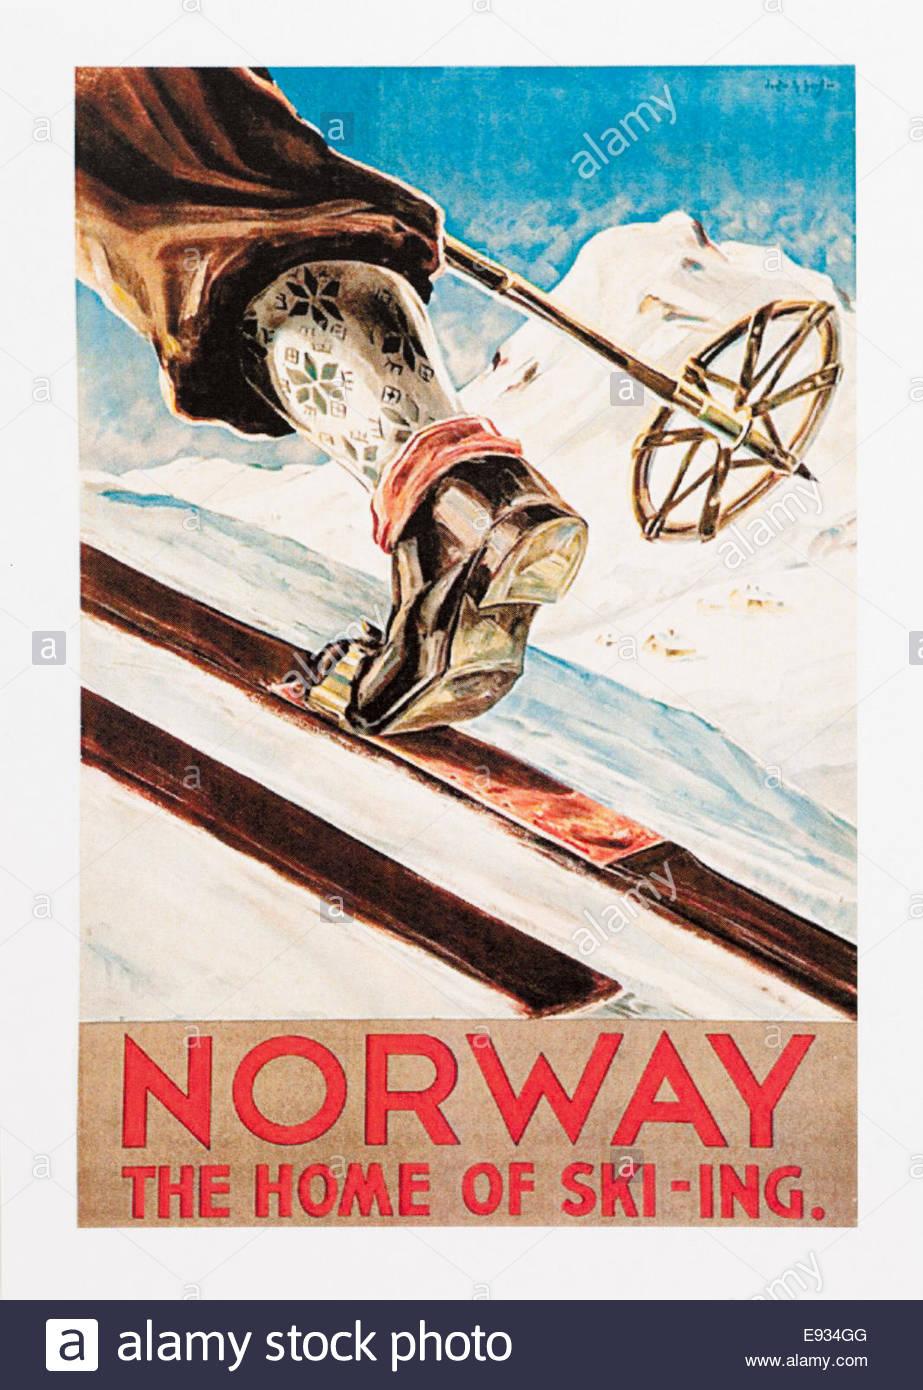 Yosemite Winter Sports Ski School 1940/'s Vintage Advertising Poster